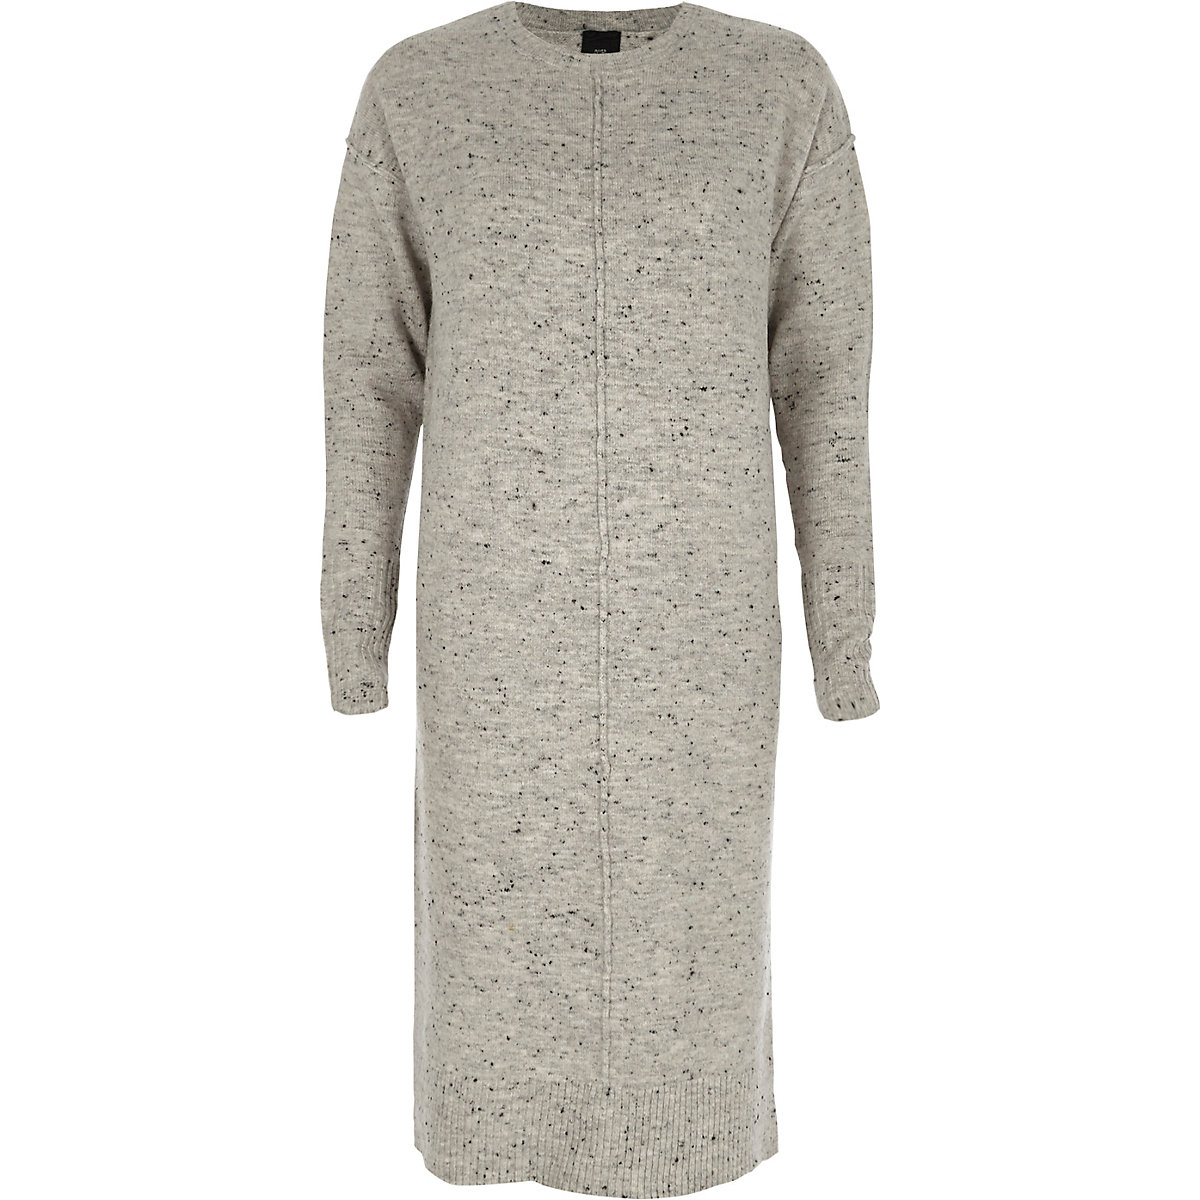 Grey neppy long sleeve knitted midi dress